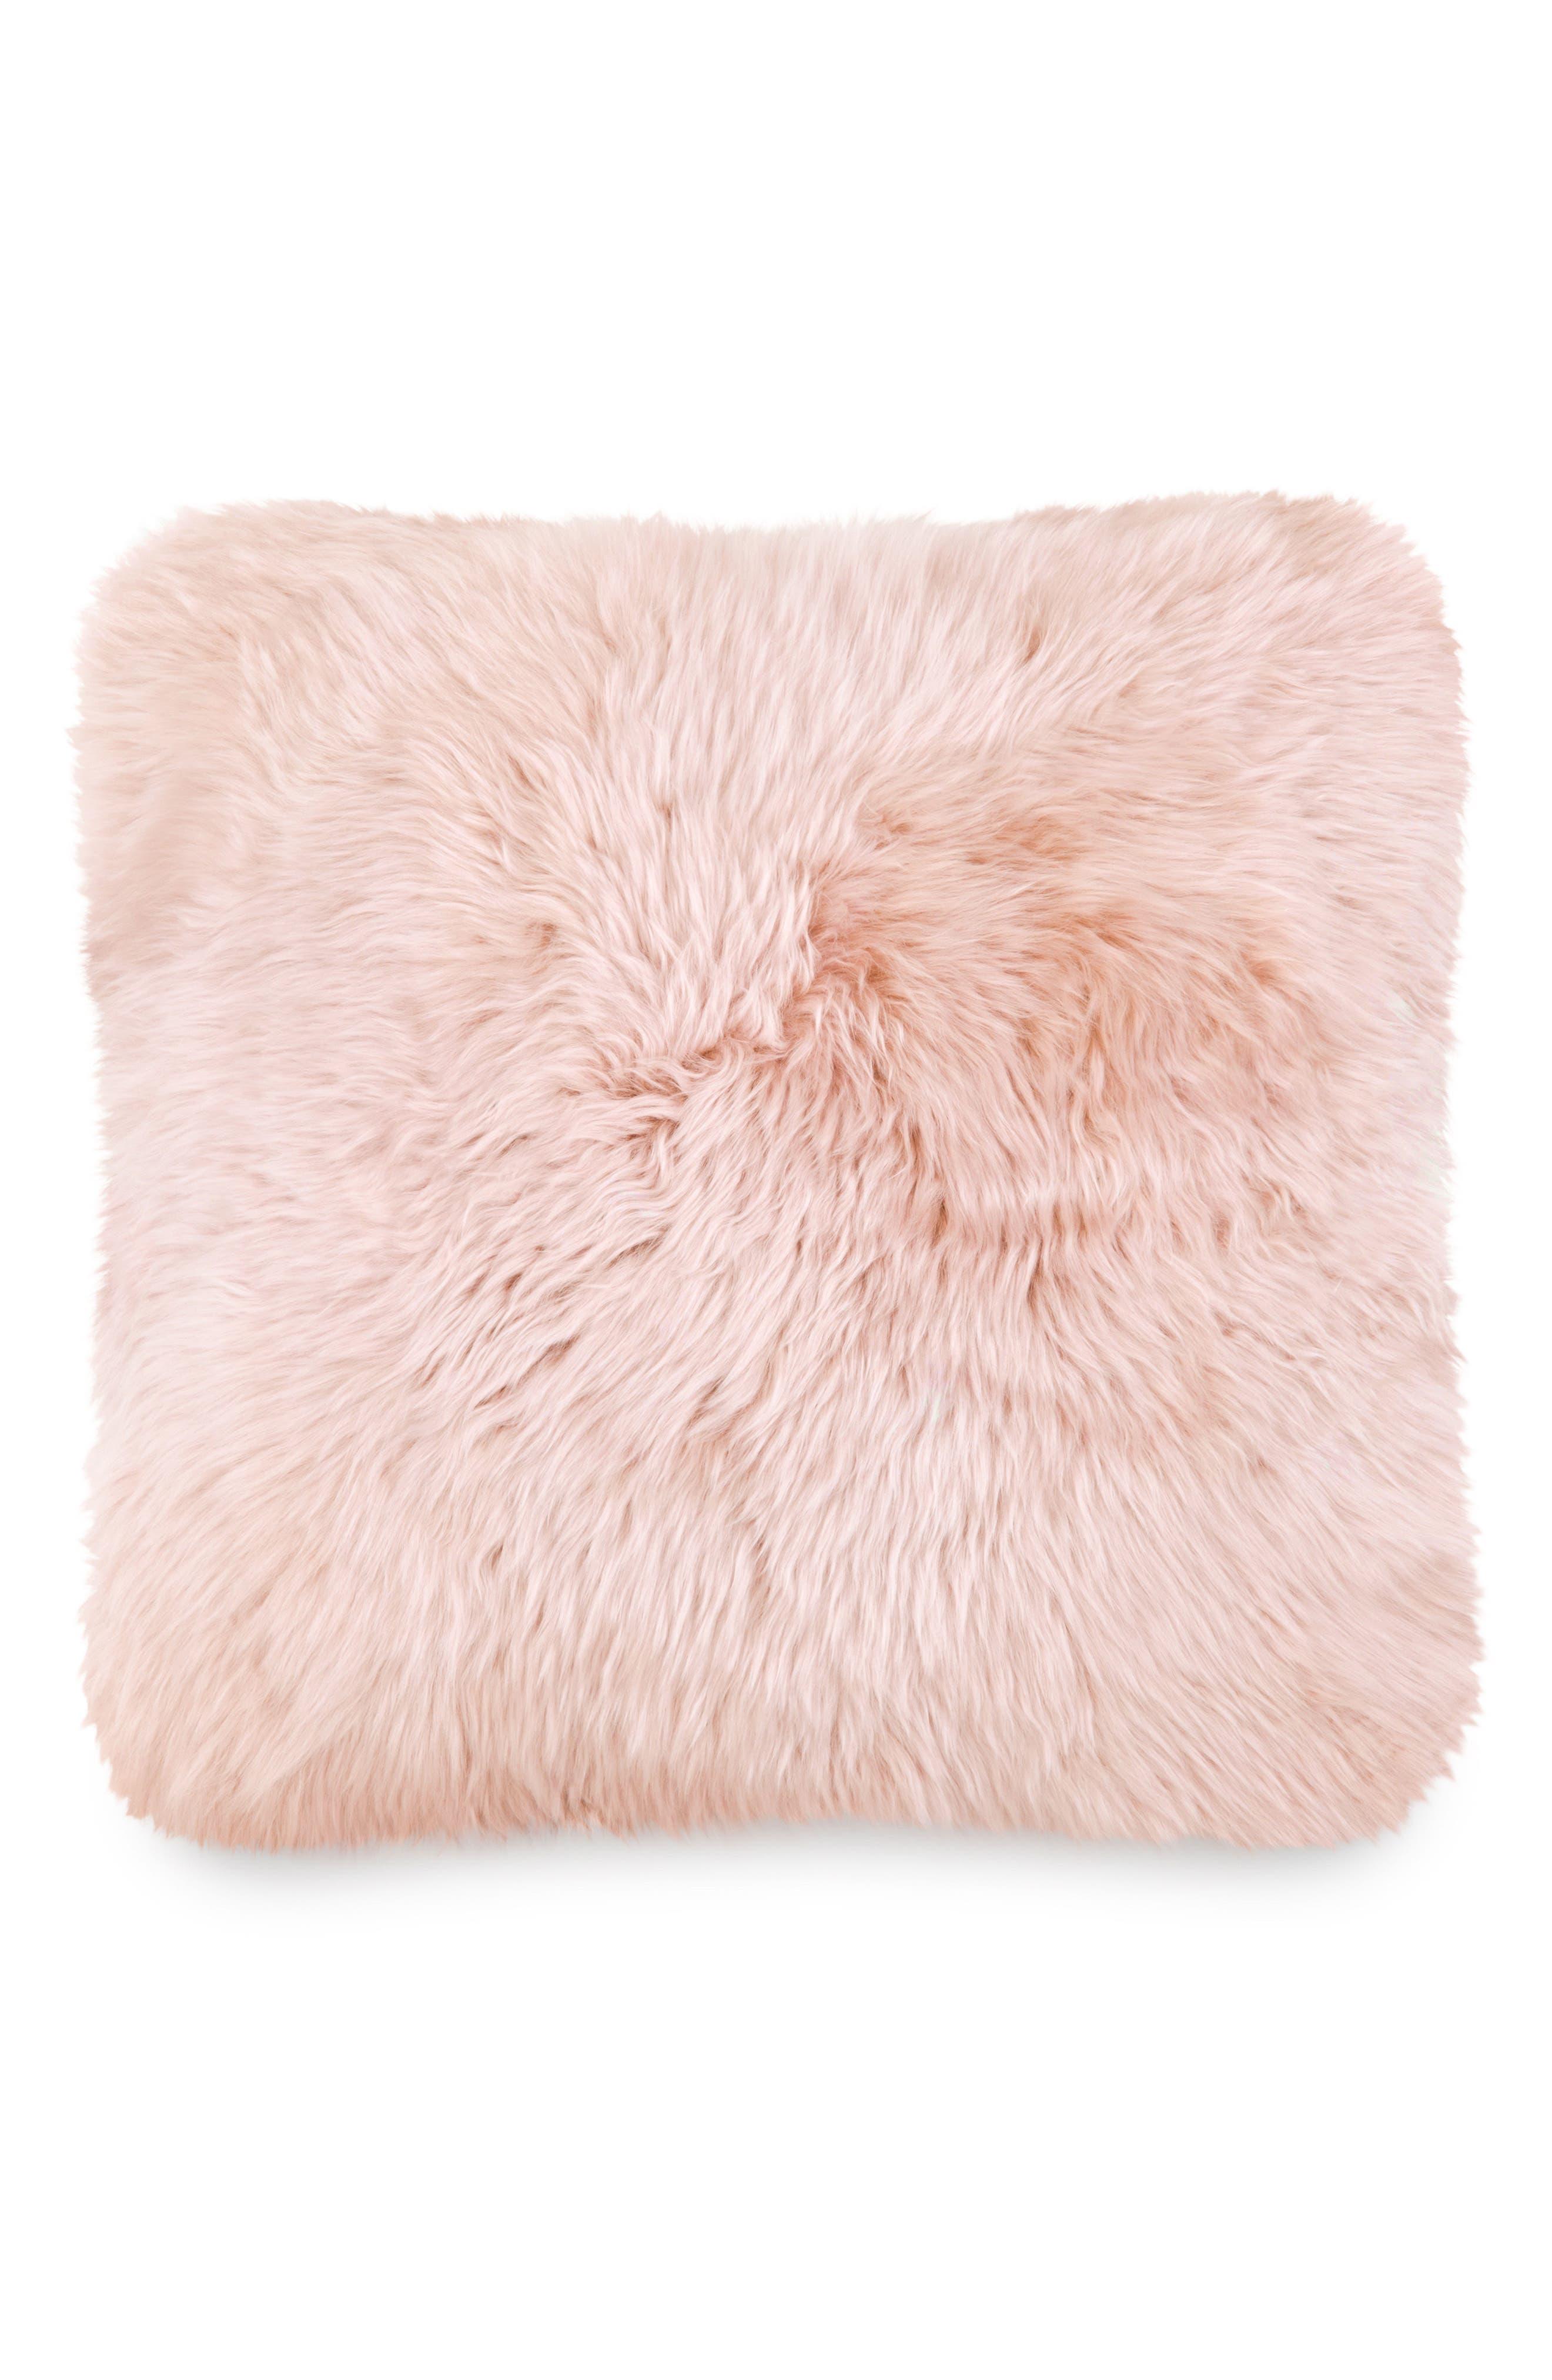 Genuine Sheepskin Accent Pillow,                         Main,                         color, Blush